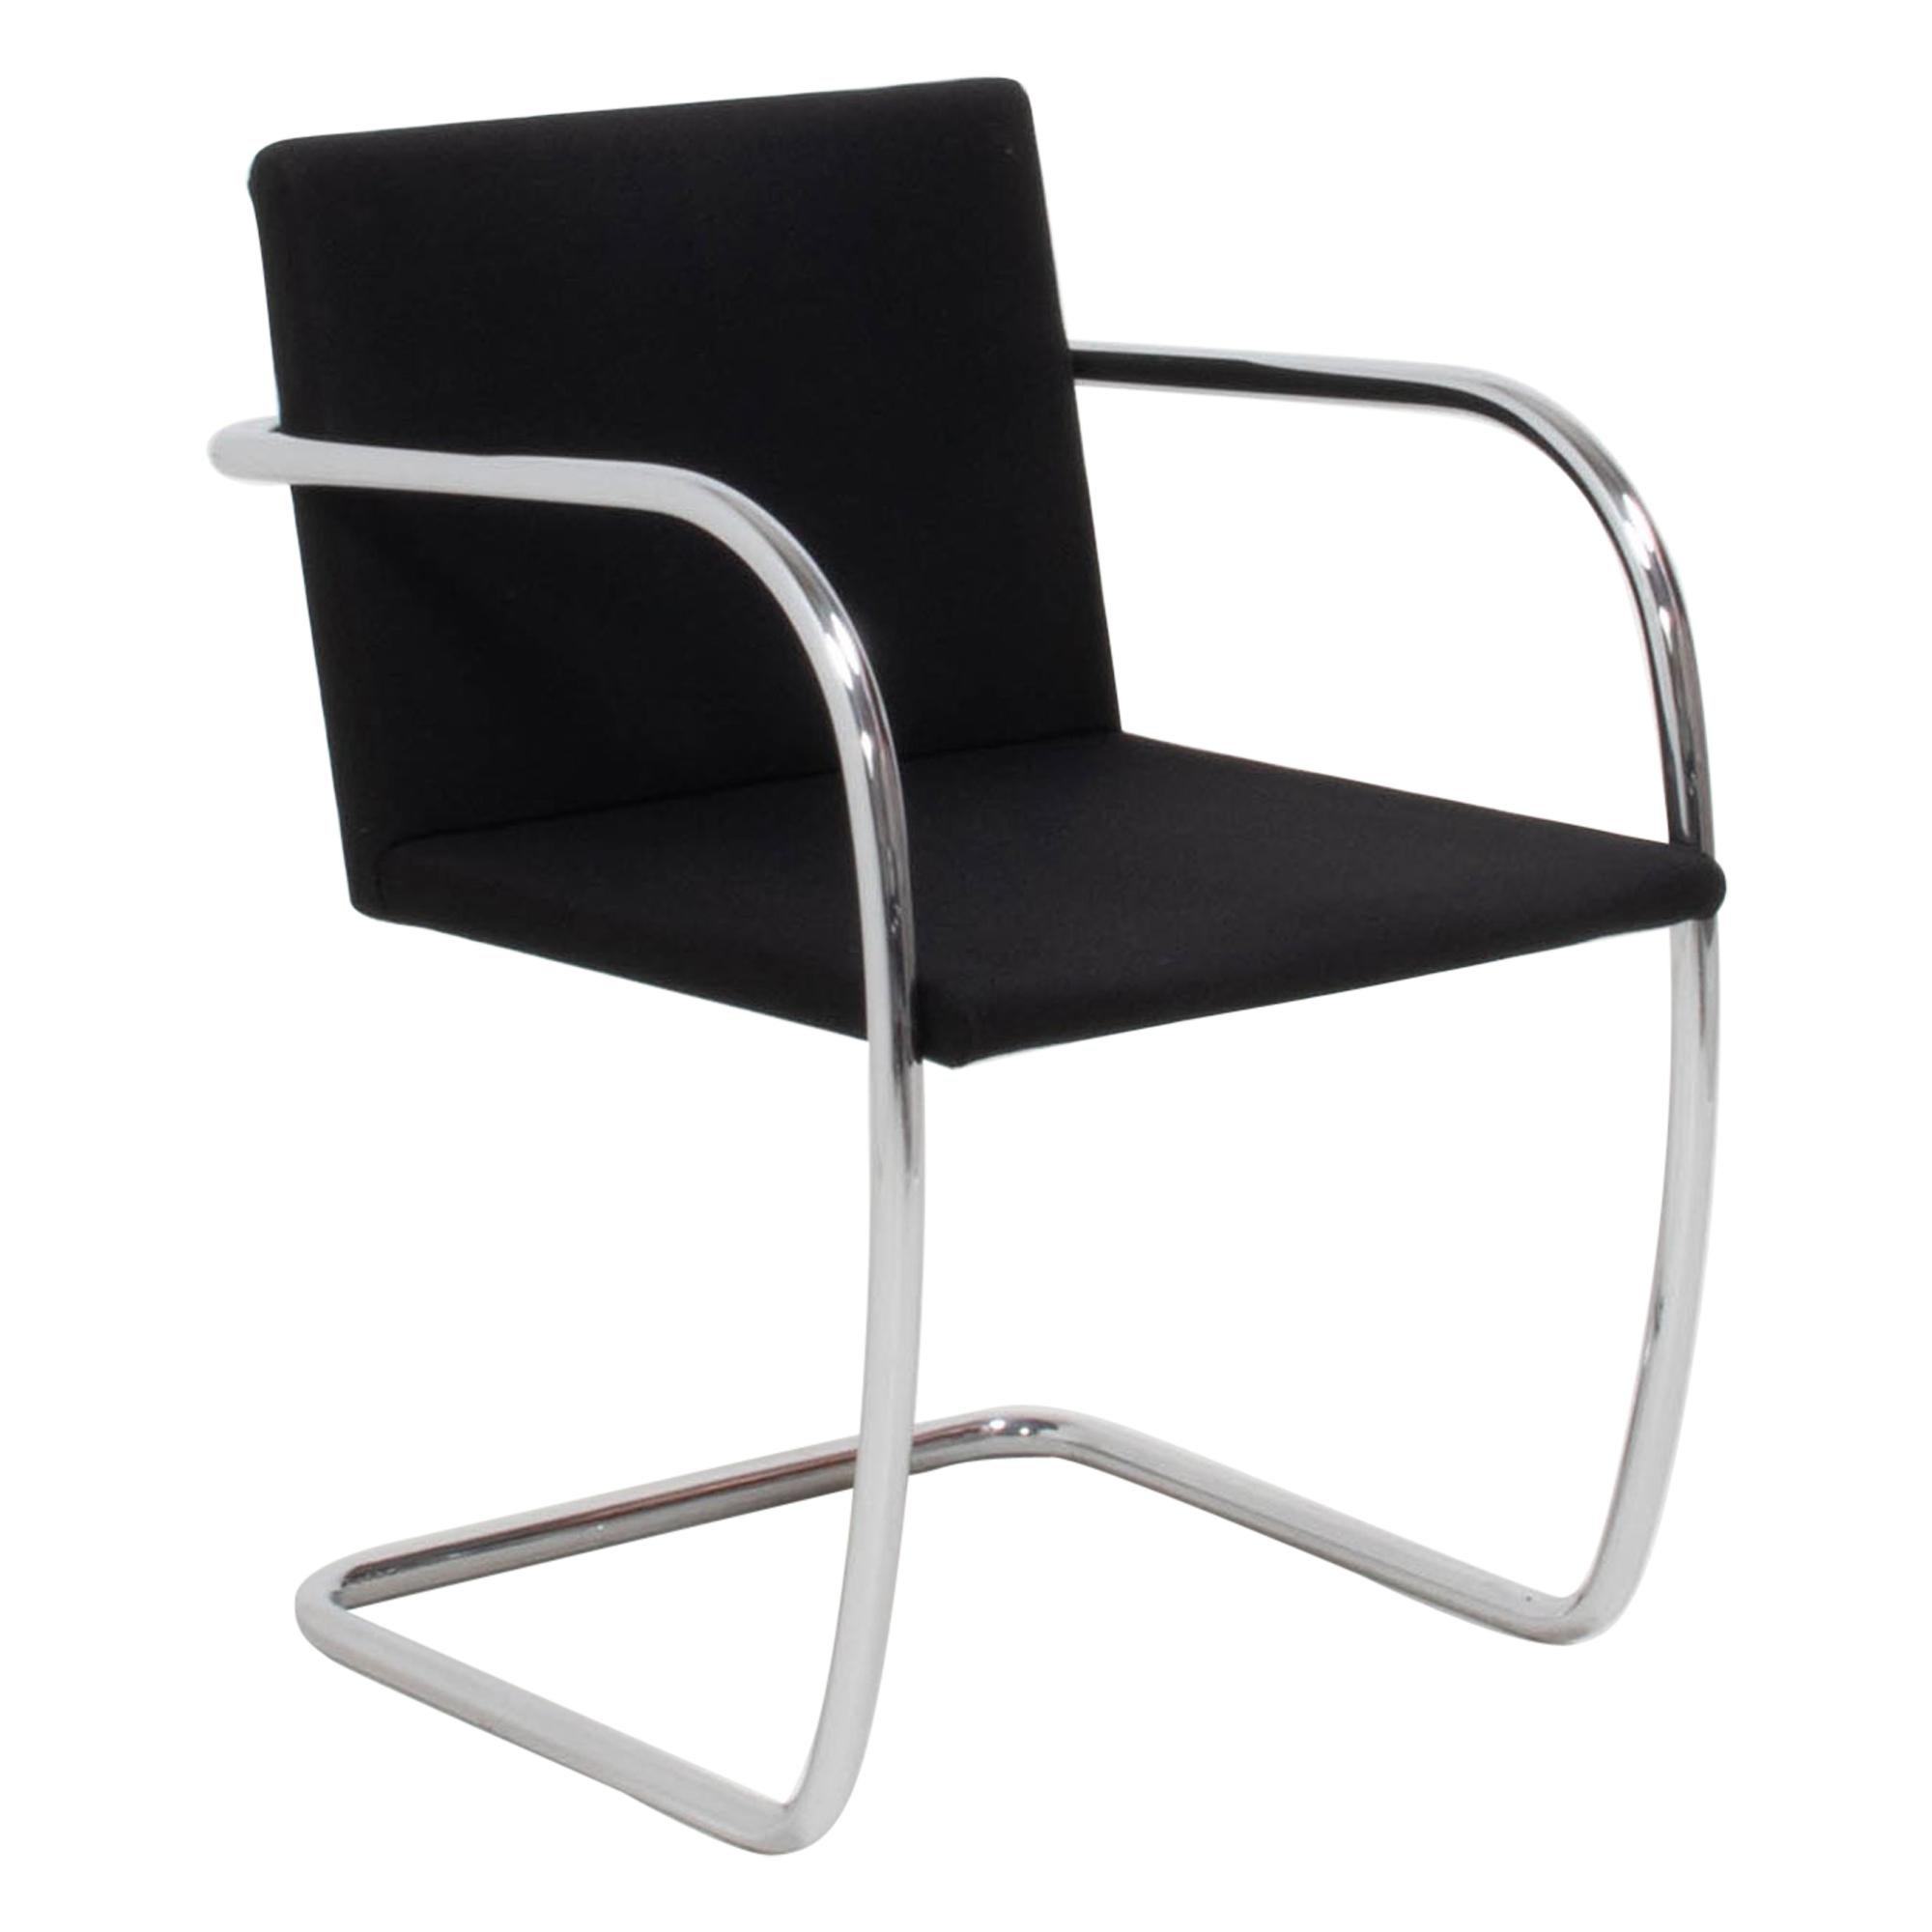 Brno Black Fabric Tubular Dining Chairs by Knoll